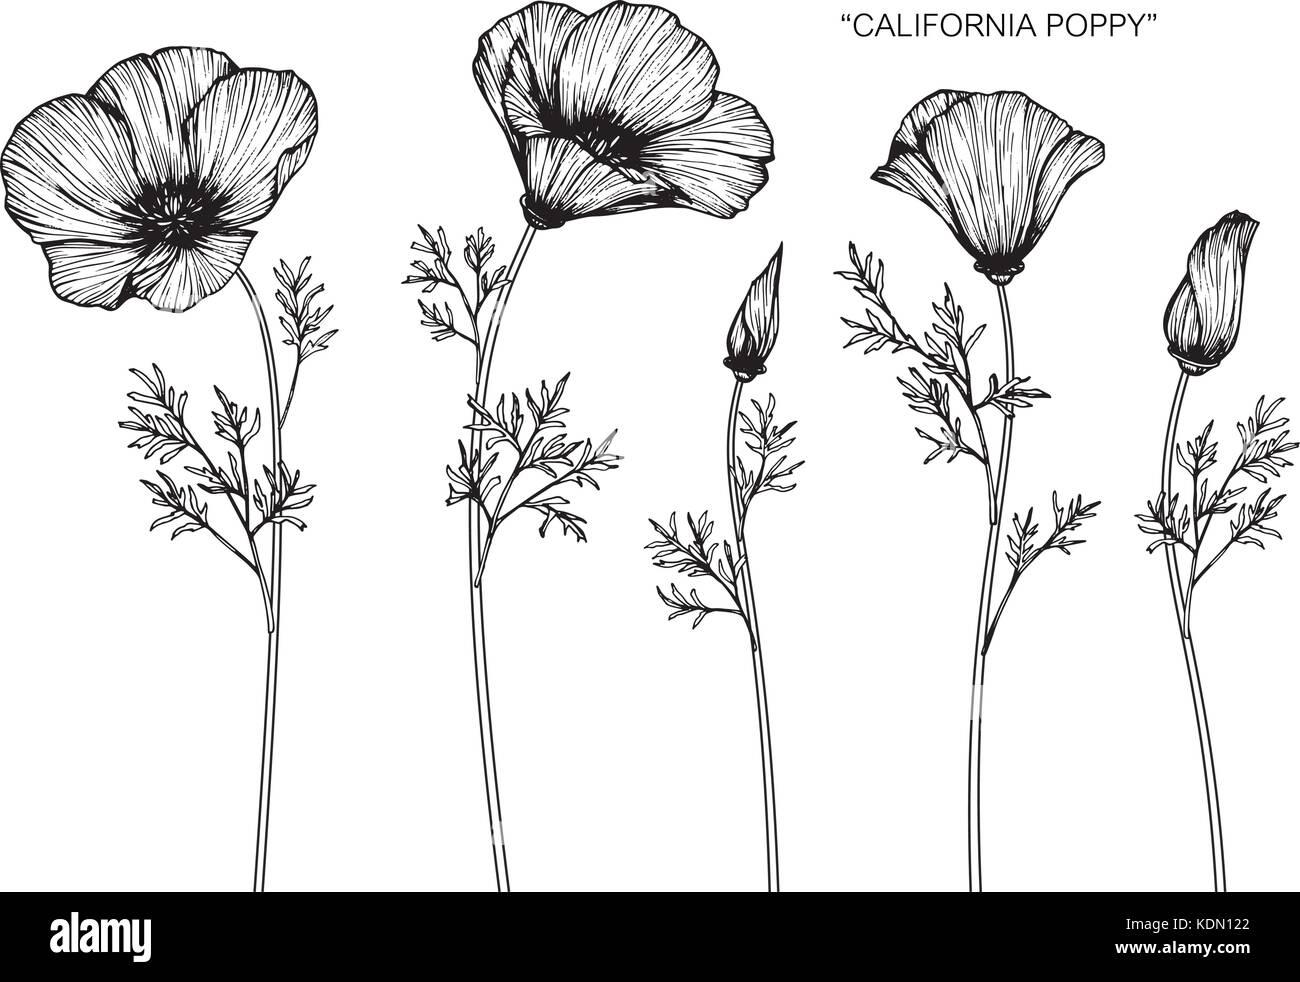 Poppy Botanical Drawing Stock Photos Poppy Botanical Drawing Stock